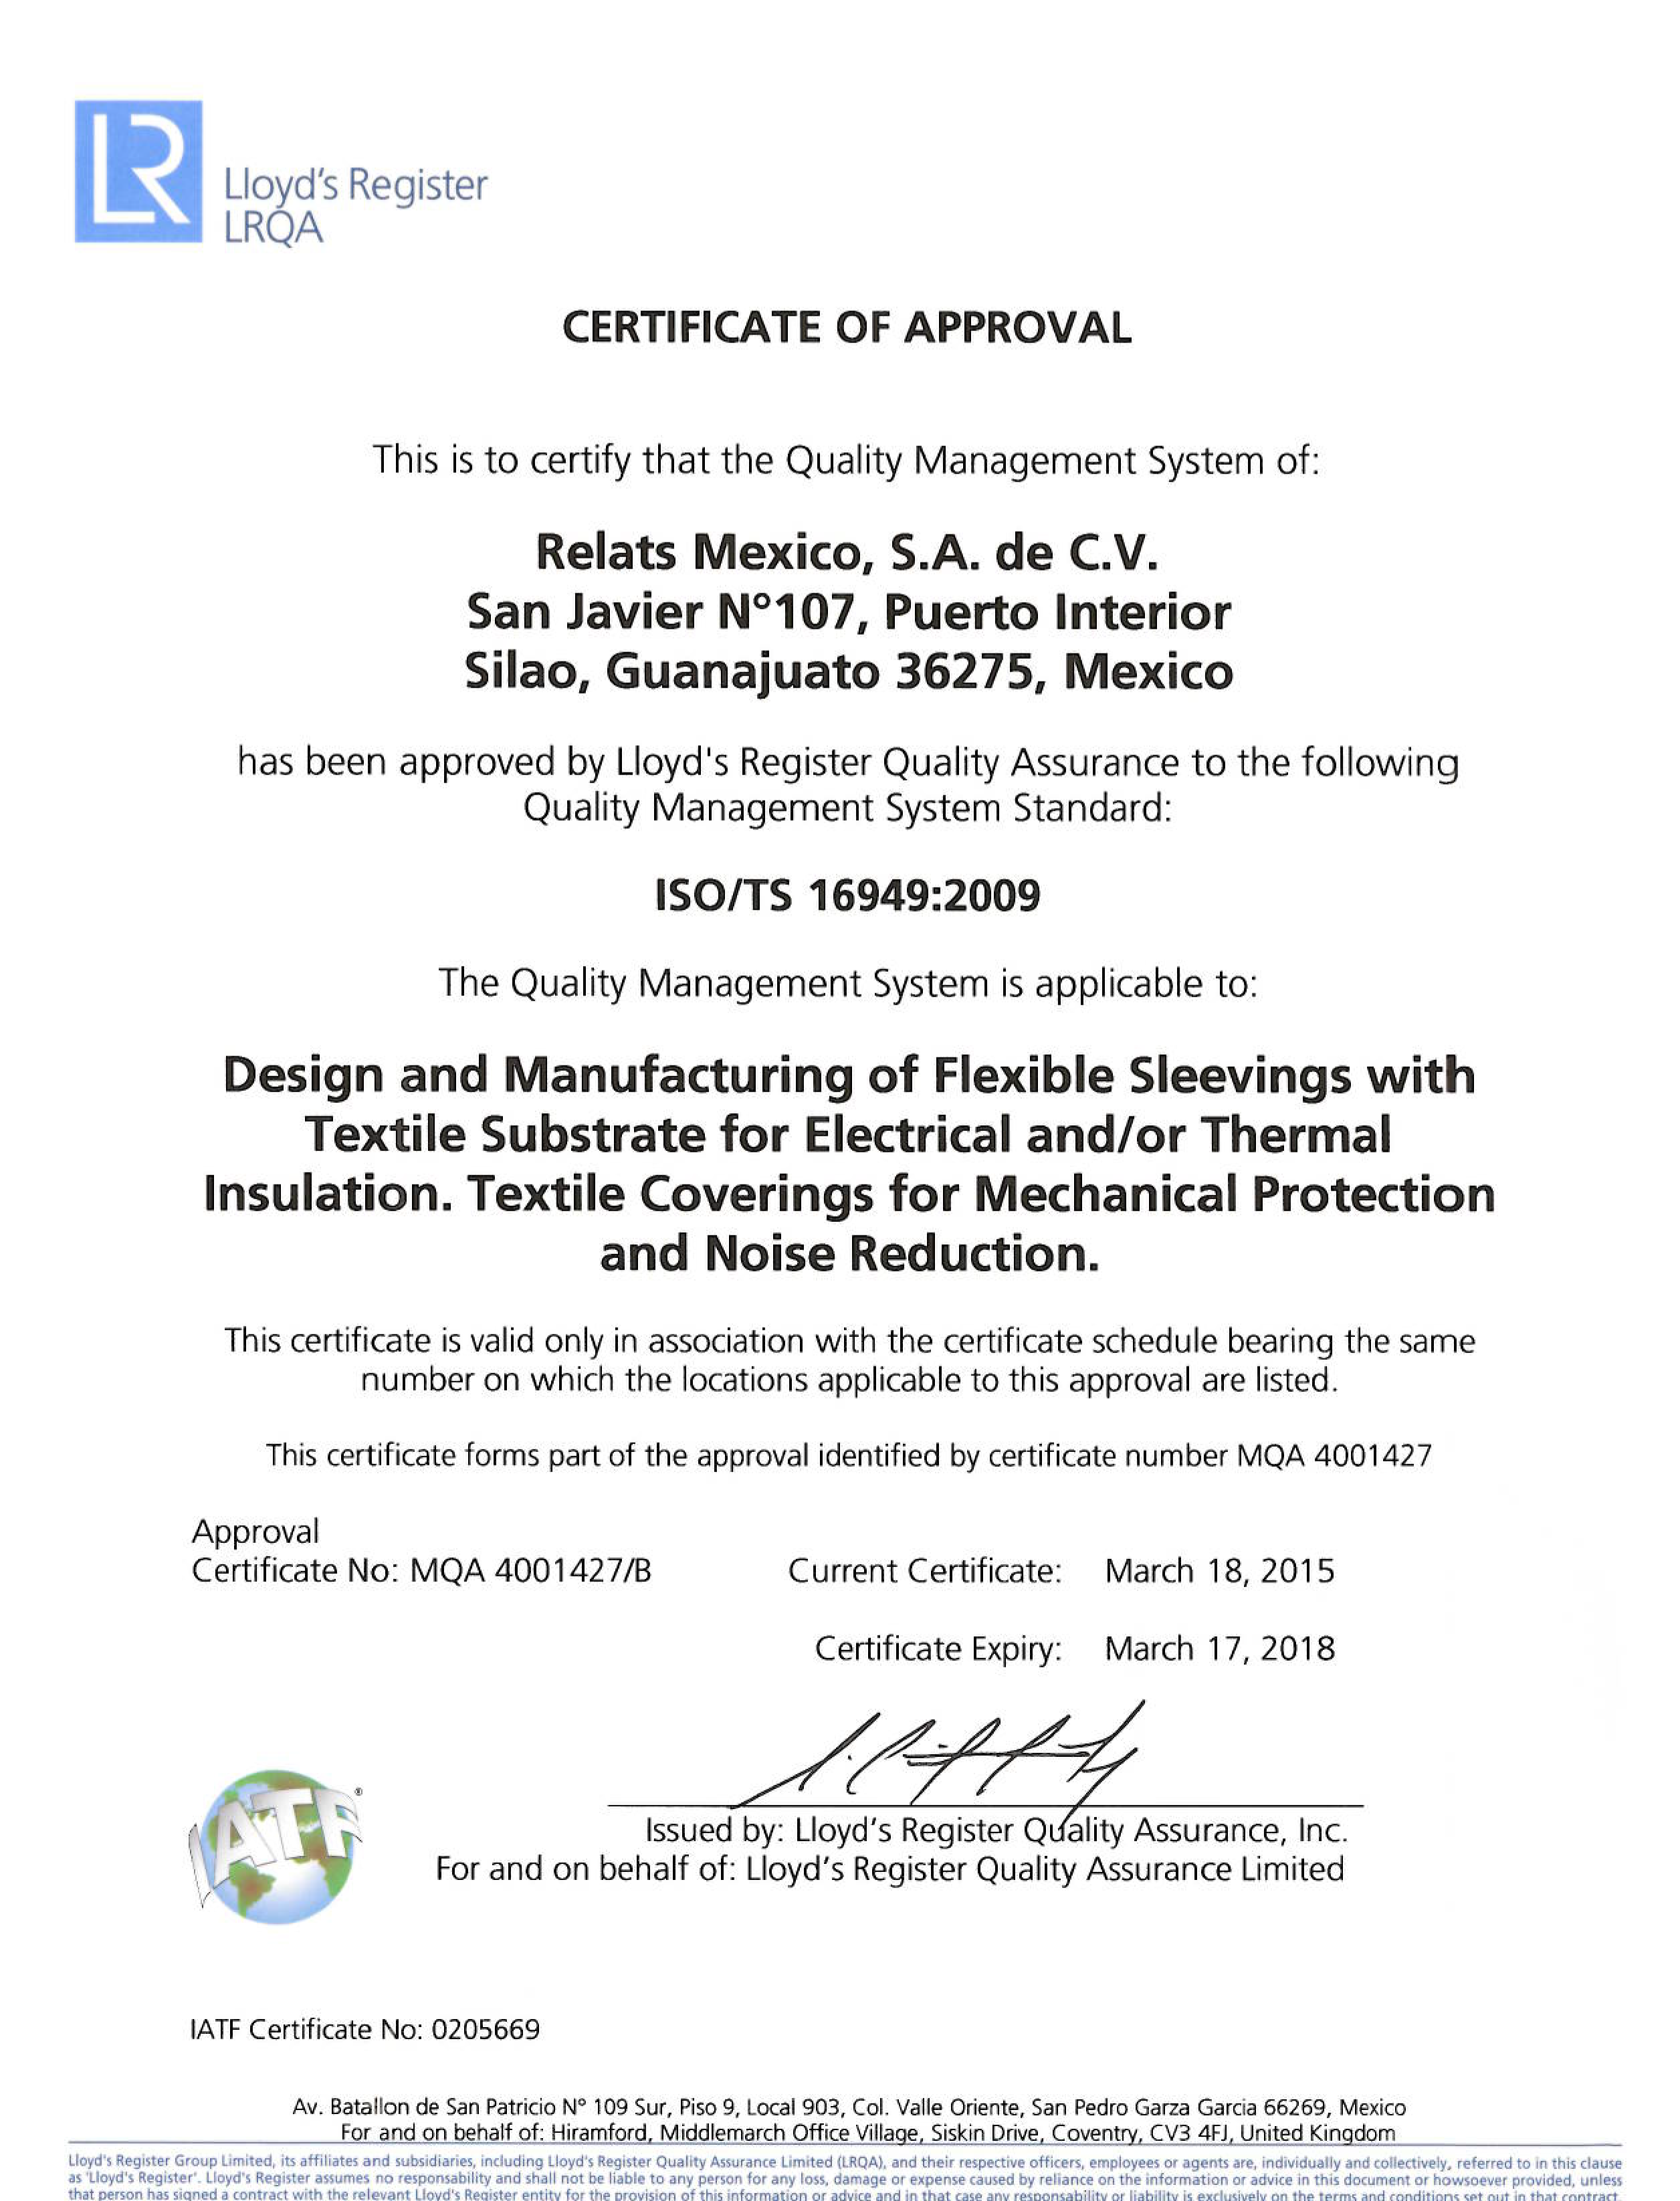 ISO/TS 16949:2009 Certificat RelatsMèxic